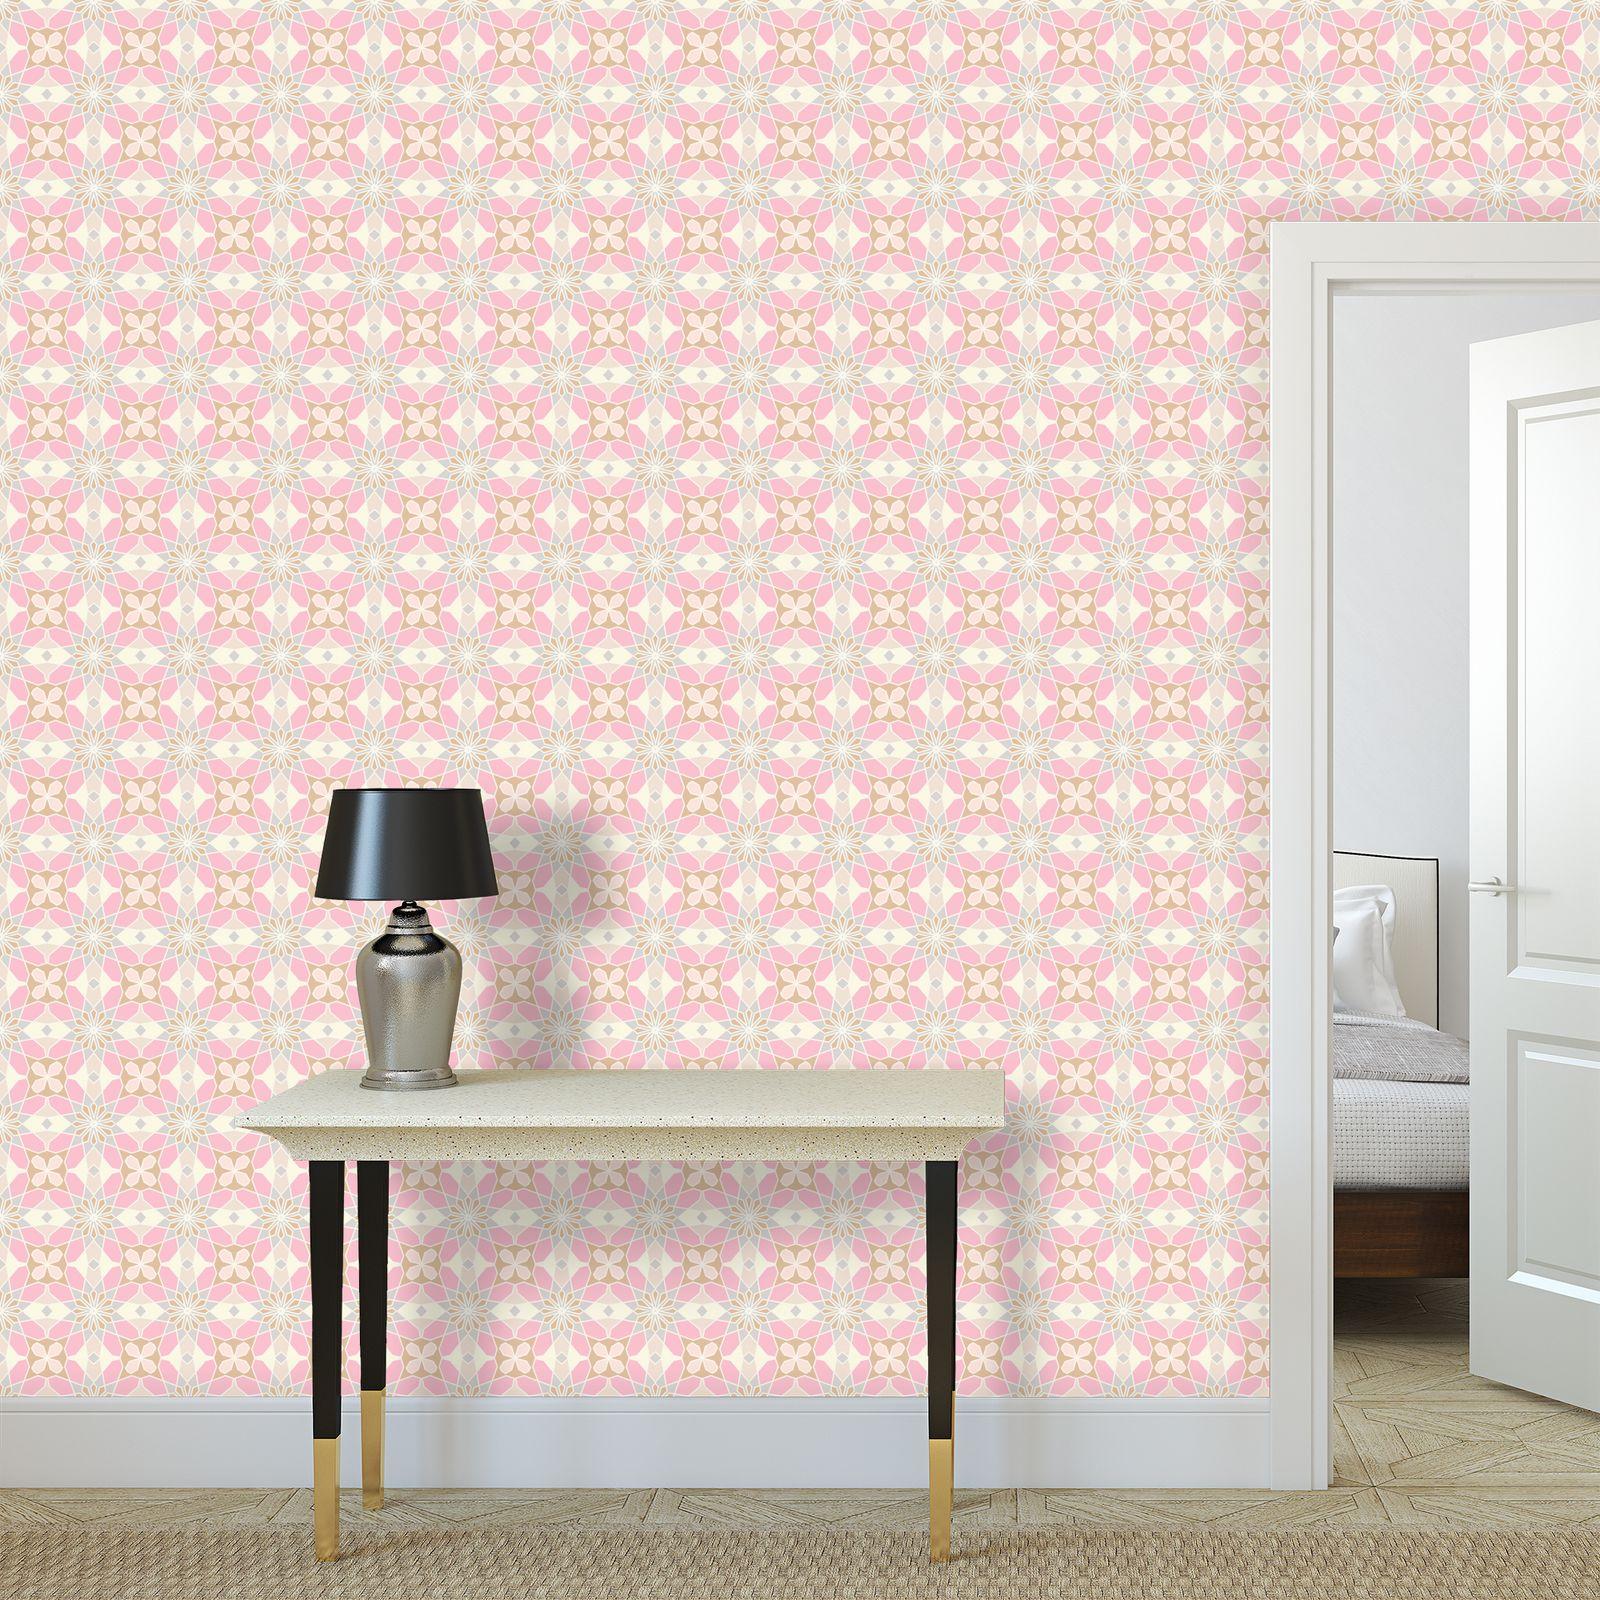 Wallpaper Rolls Shapes 7